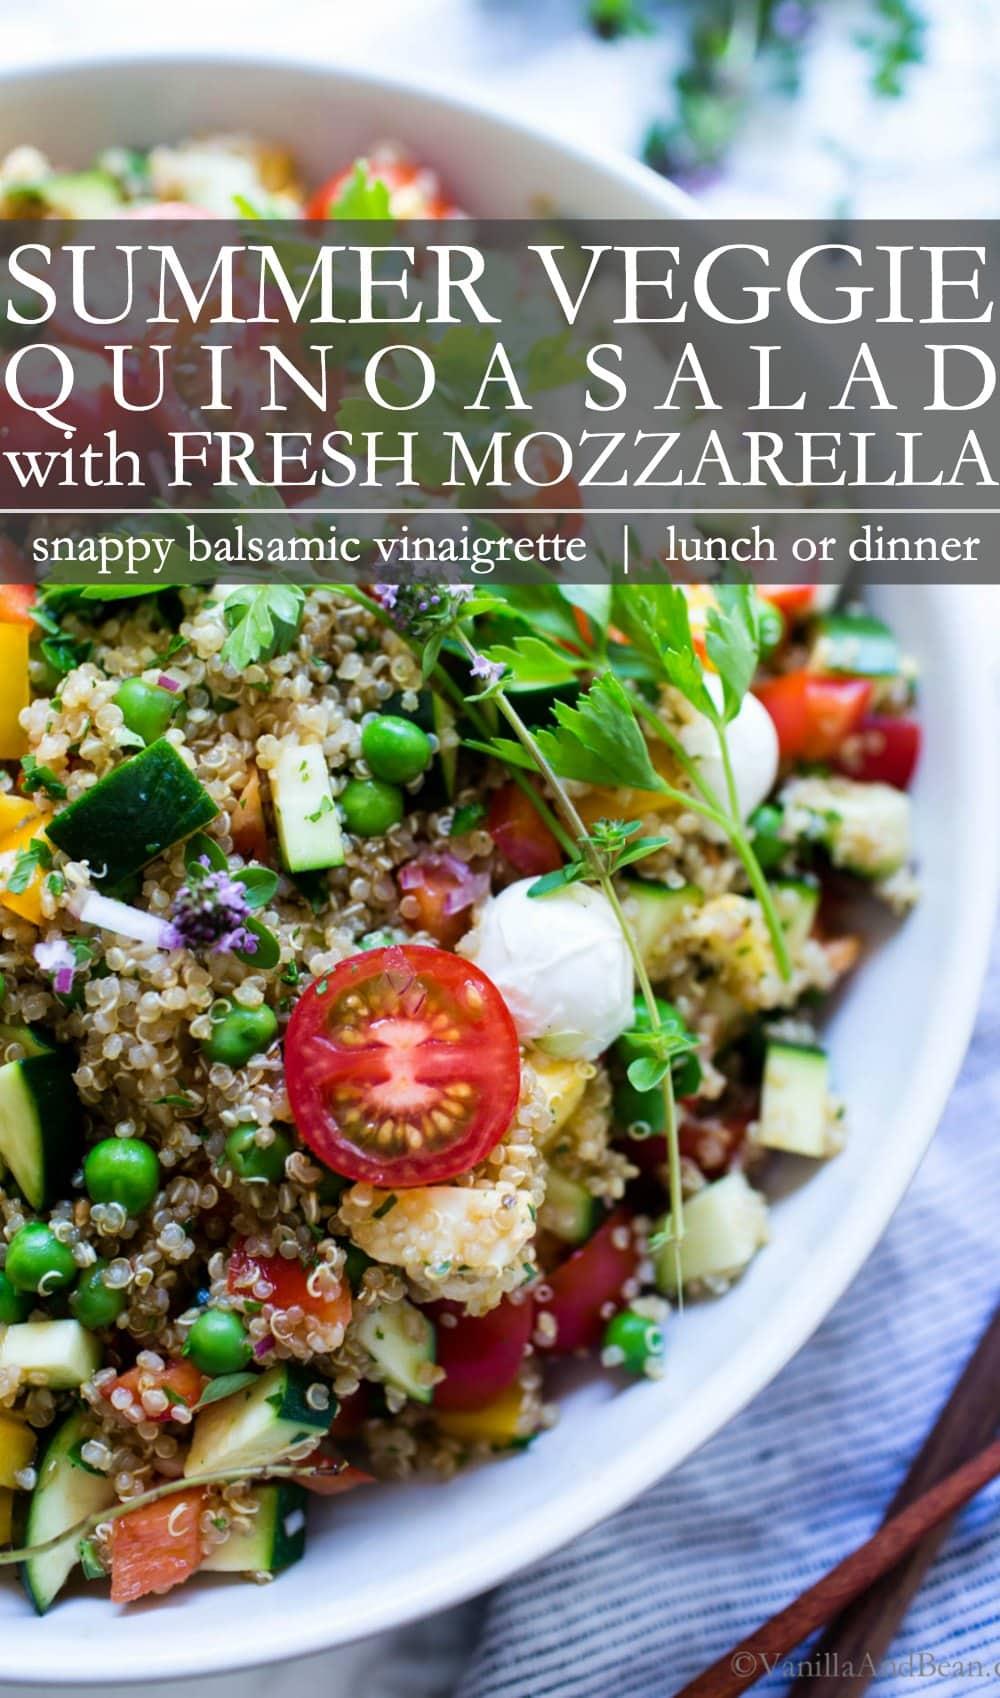 Pinterest Pin for Summer Quinoa Salad